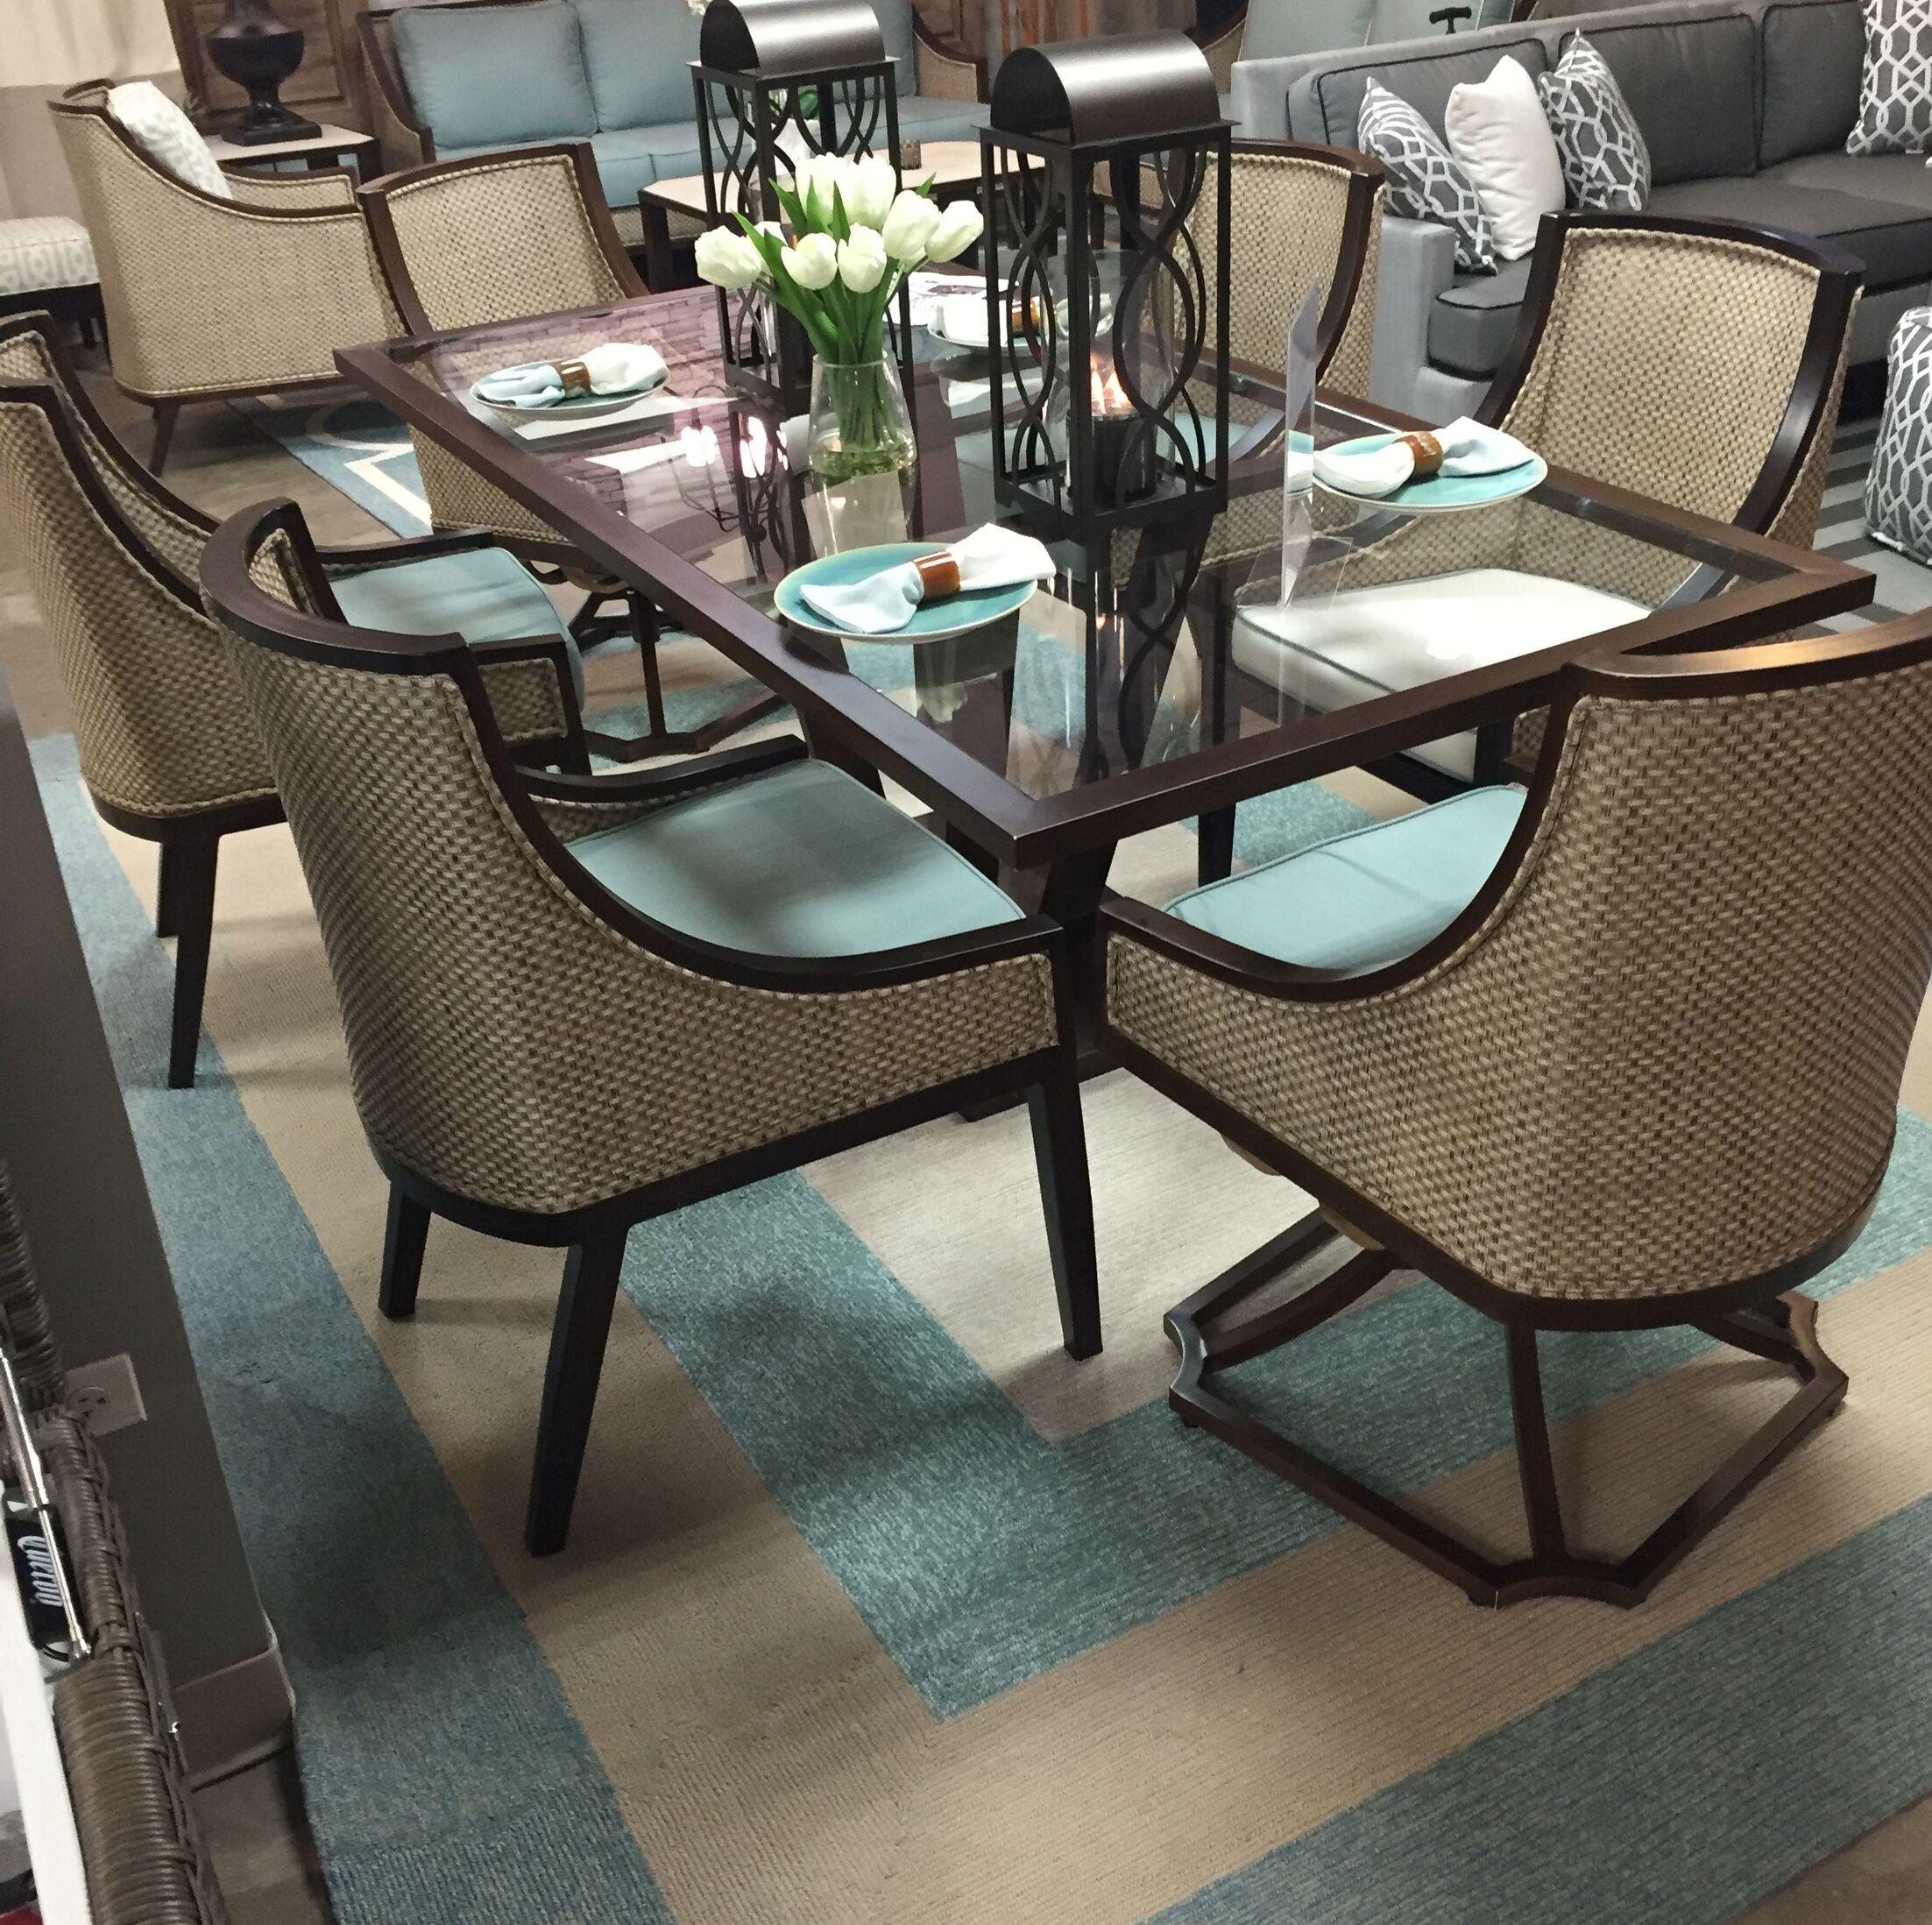 Hamptons Highview Hand-Hooked Spa Indoor/Outdoor Area Rug Rug Size: Rectangle 5' x 7'